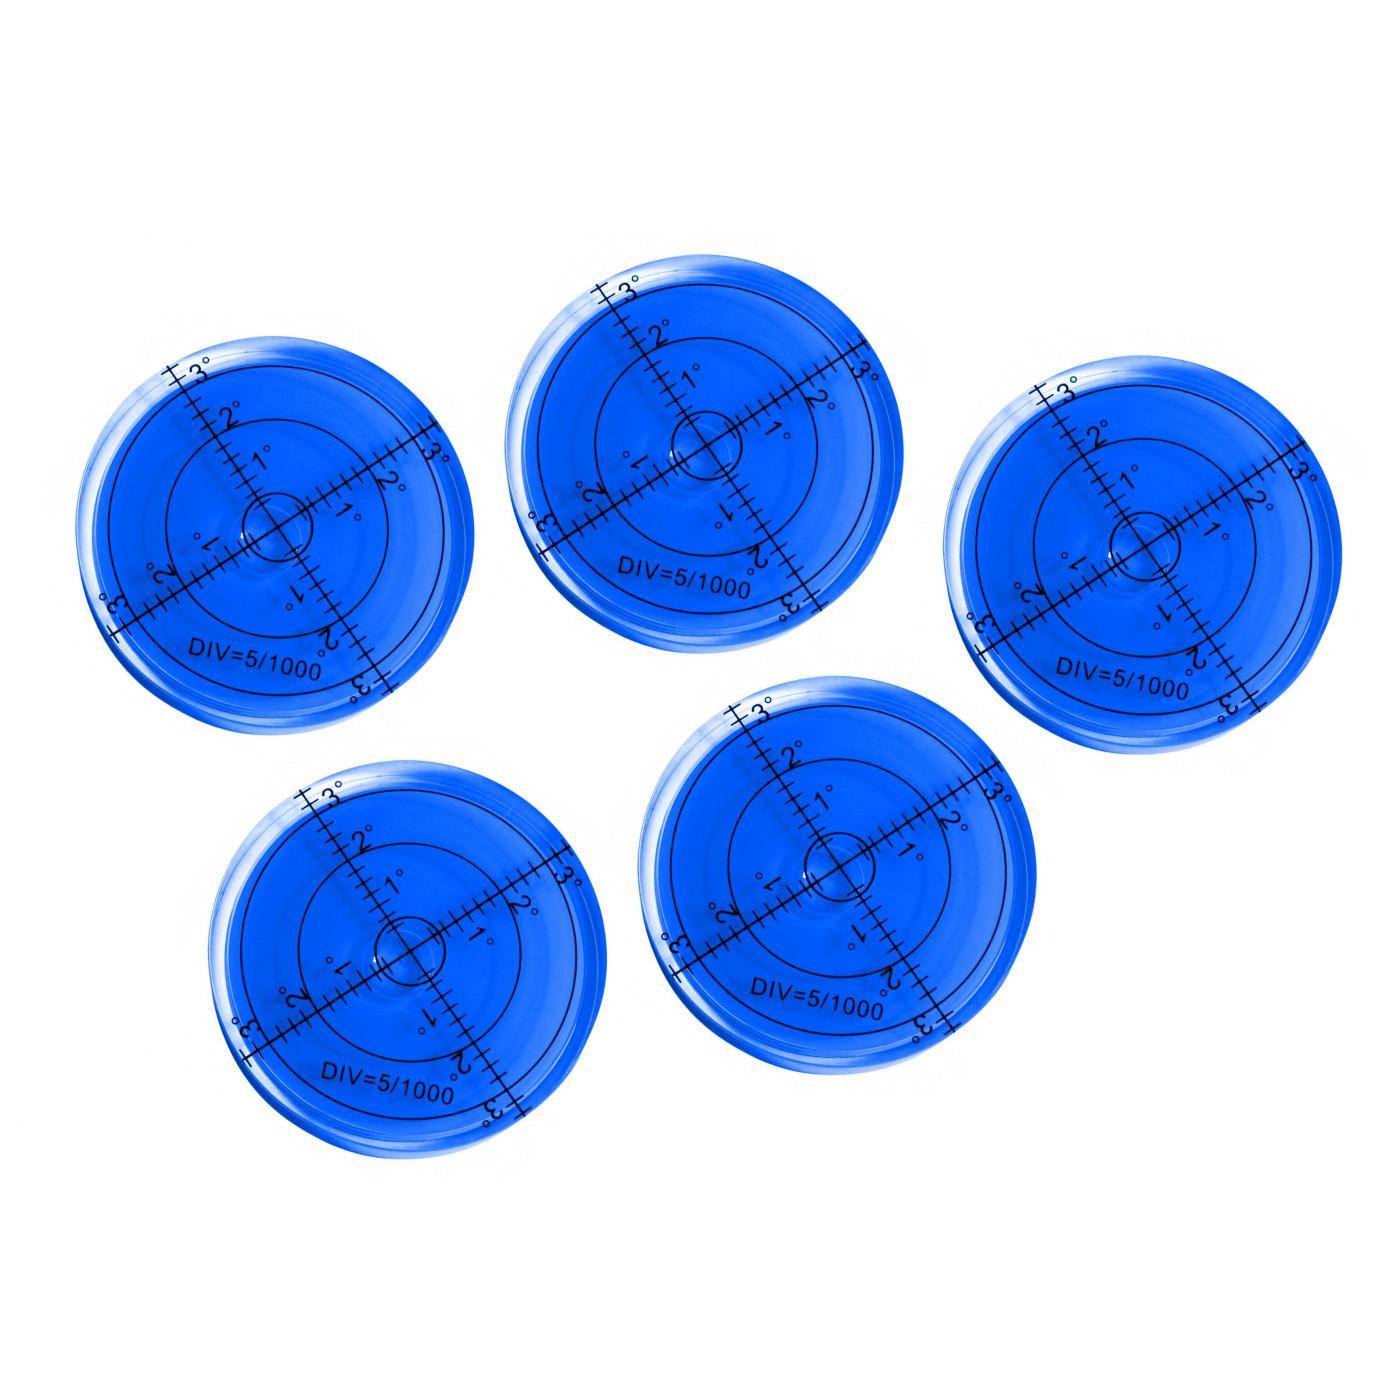 Set of 5 round bubble levels (66x11 mm, blue)  - 1